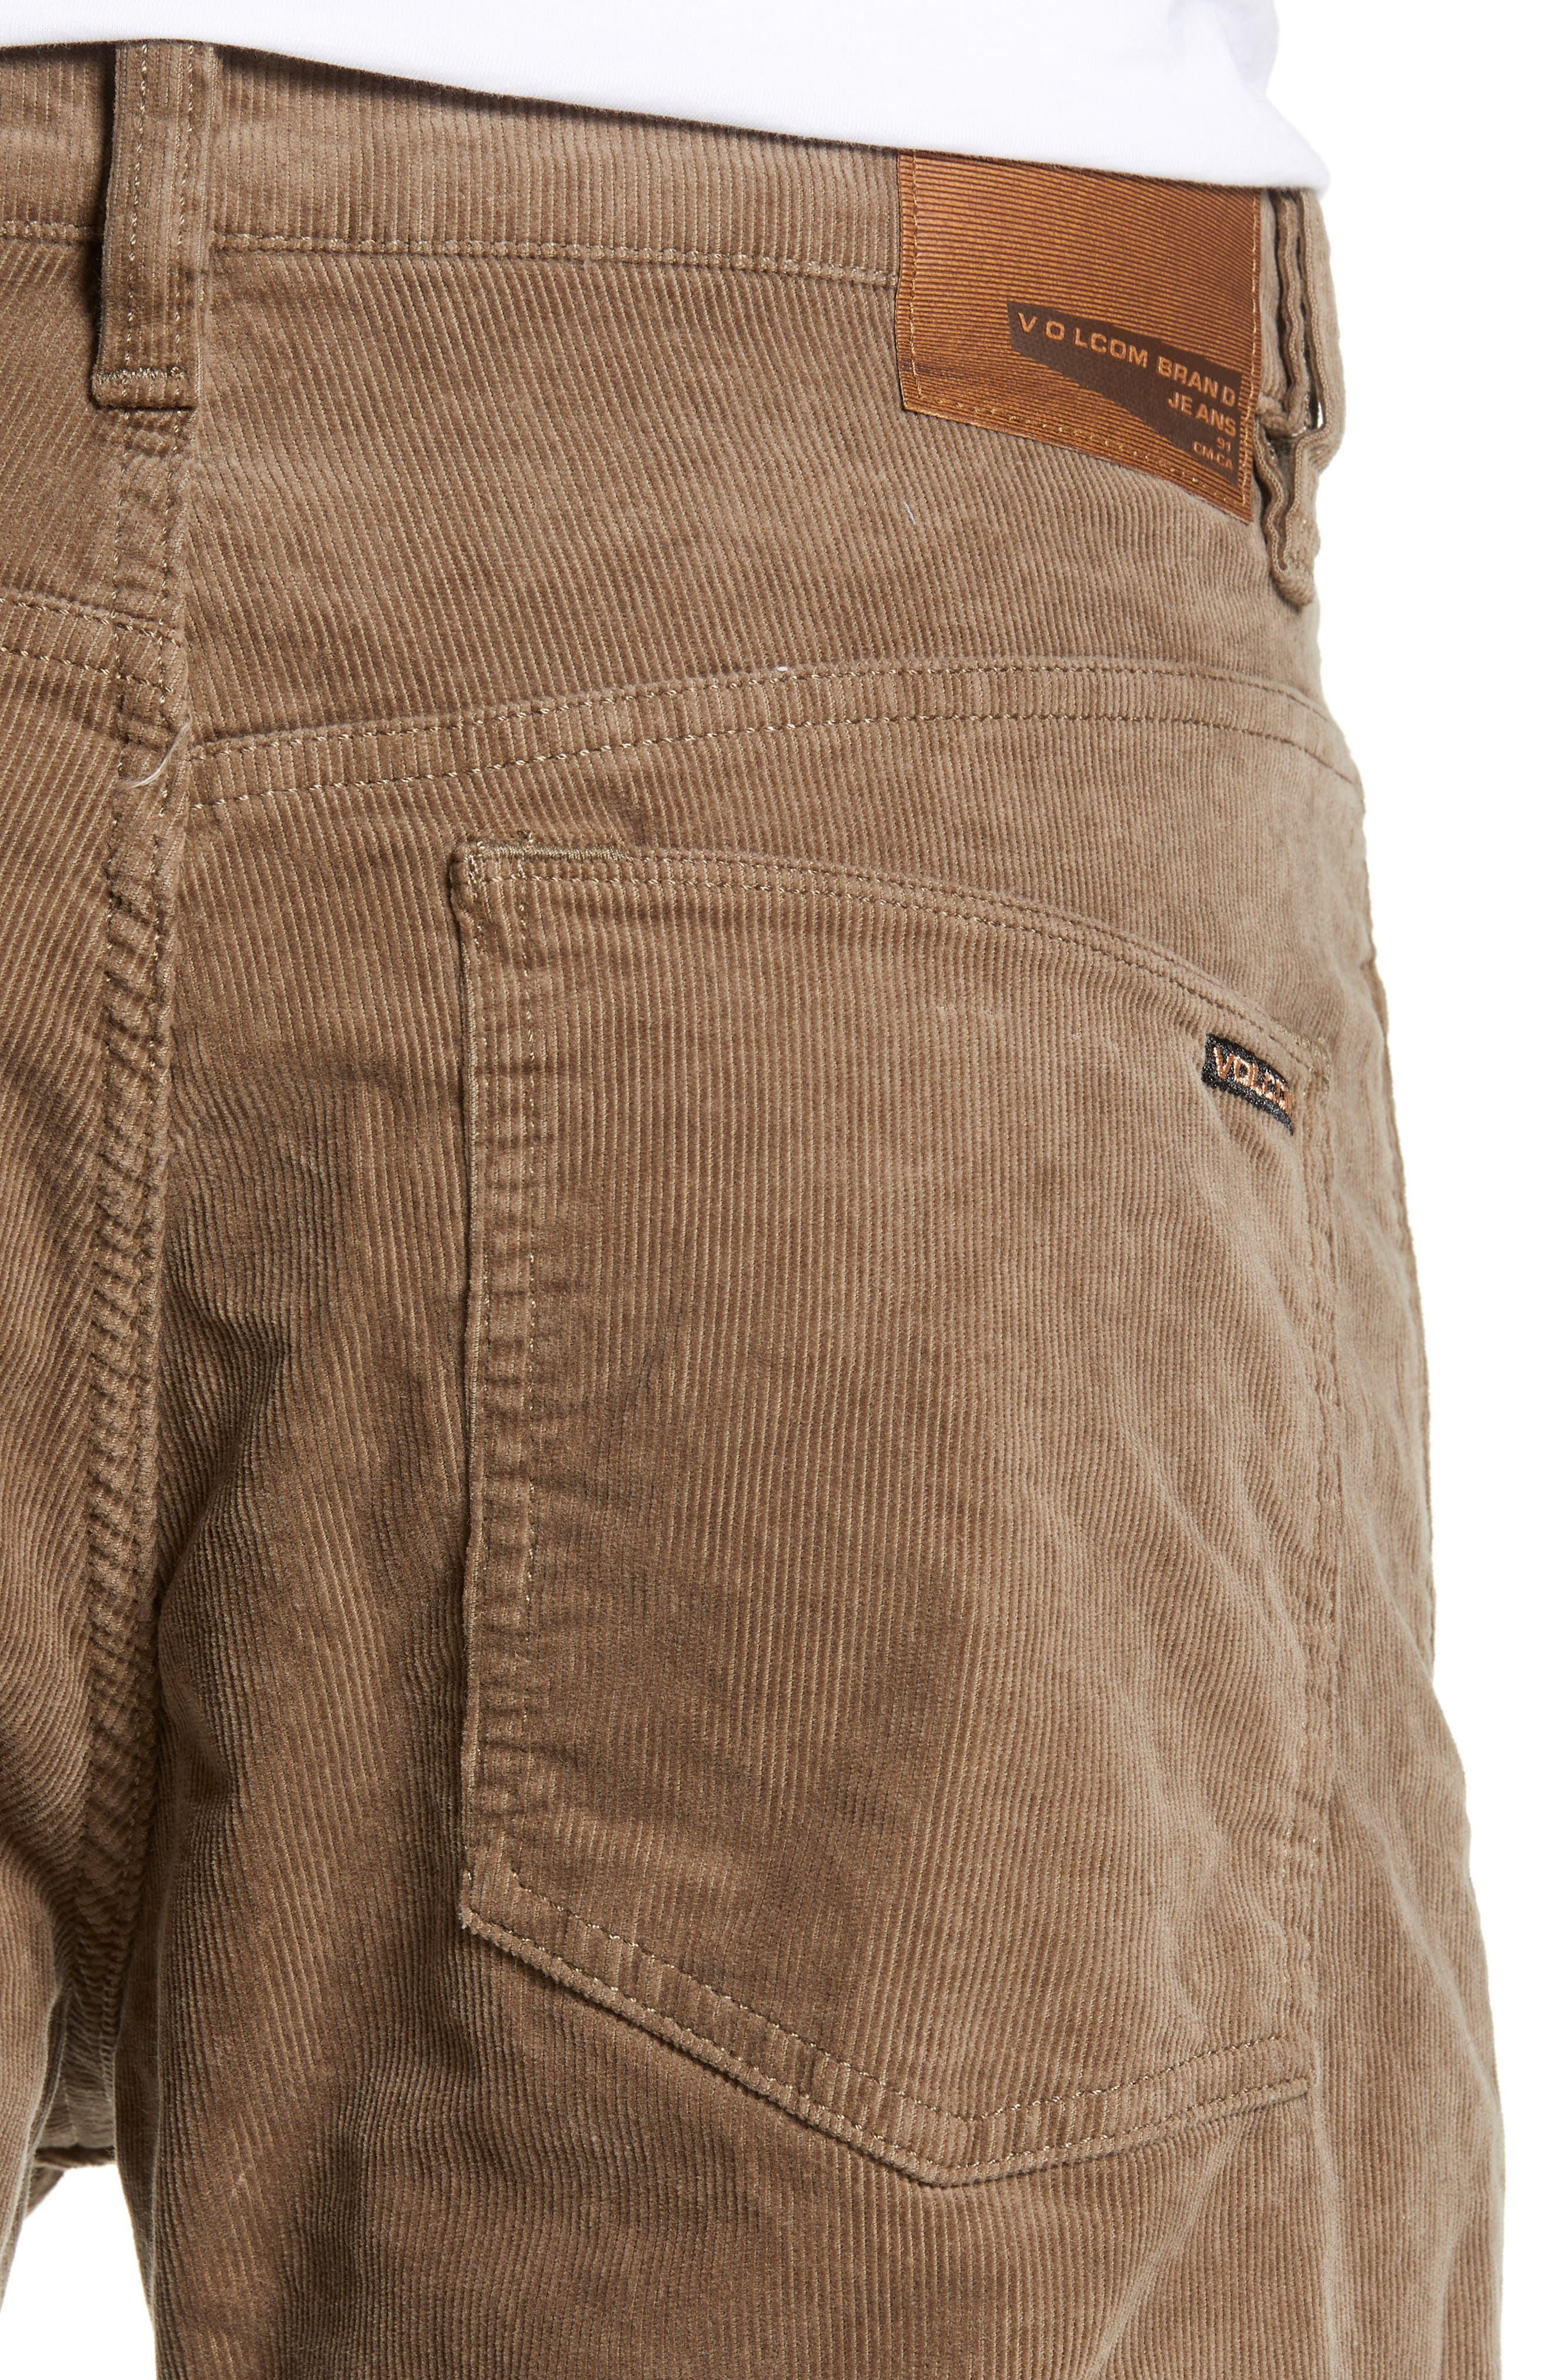 Solver Straight Leg Corduroy Pants,                             Alternate thumbnail 4, color,                             MUSHROOM